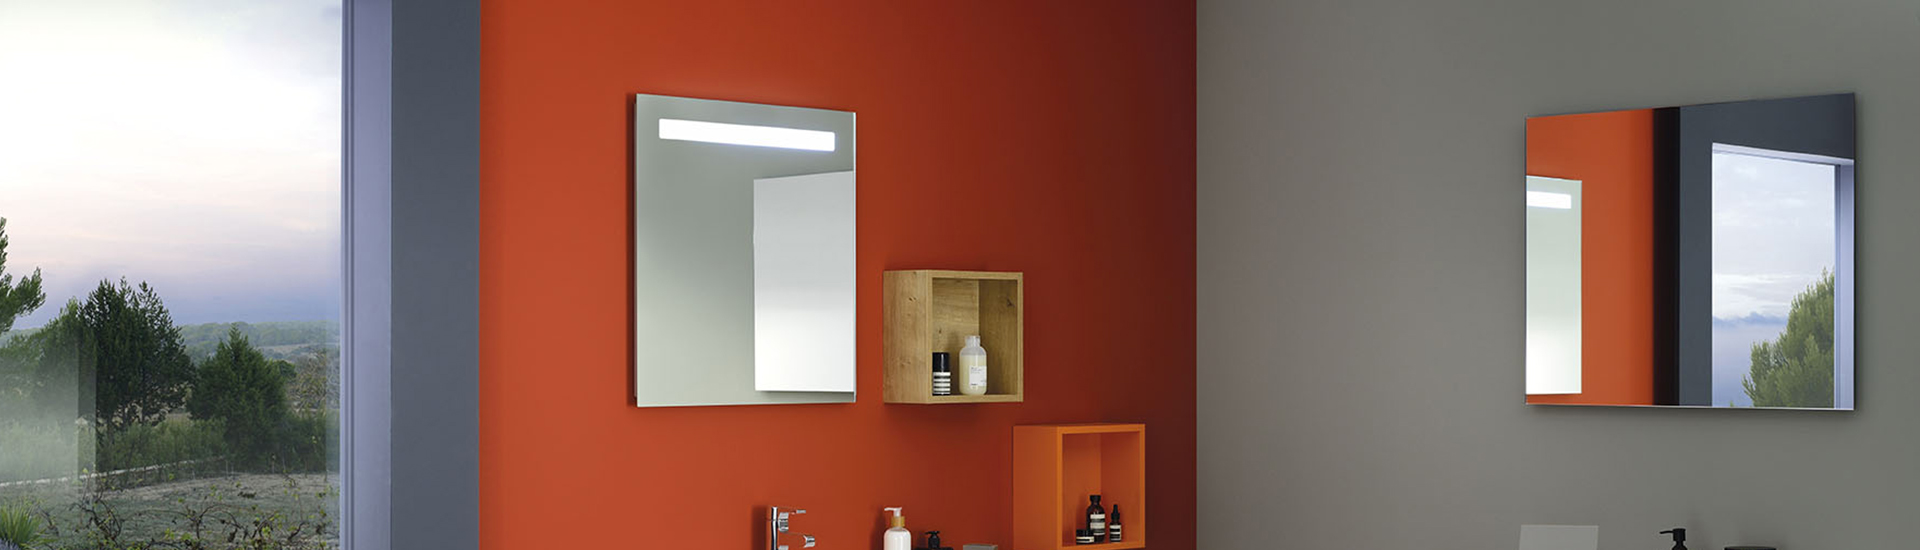 Miroir sanijura reflet amazing miroir avec eclairage for Miroir sans reflet